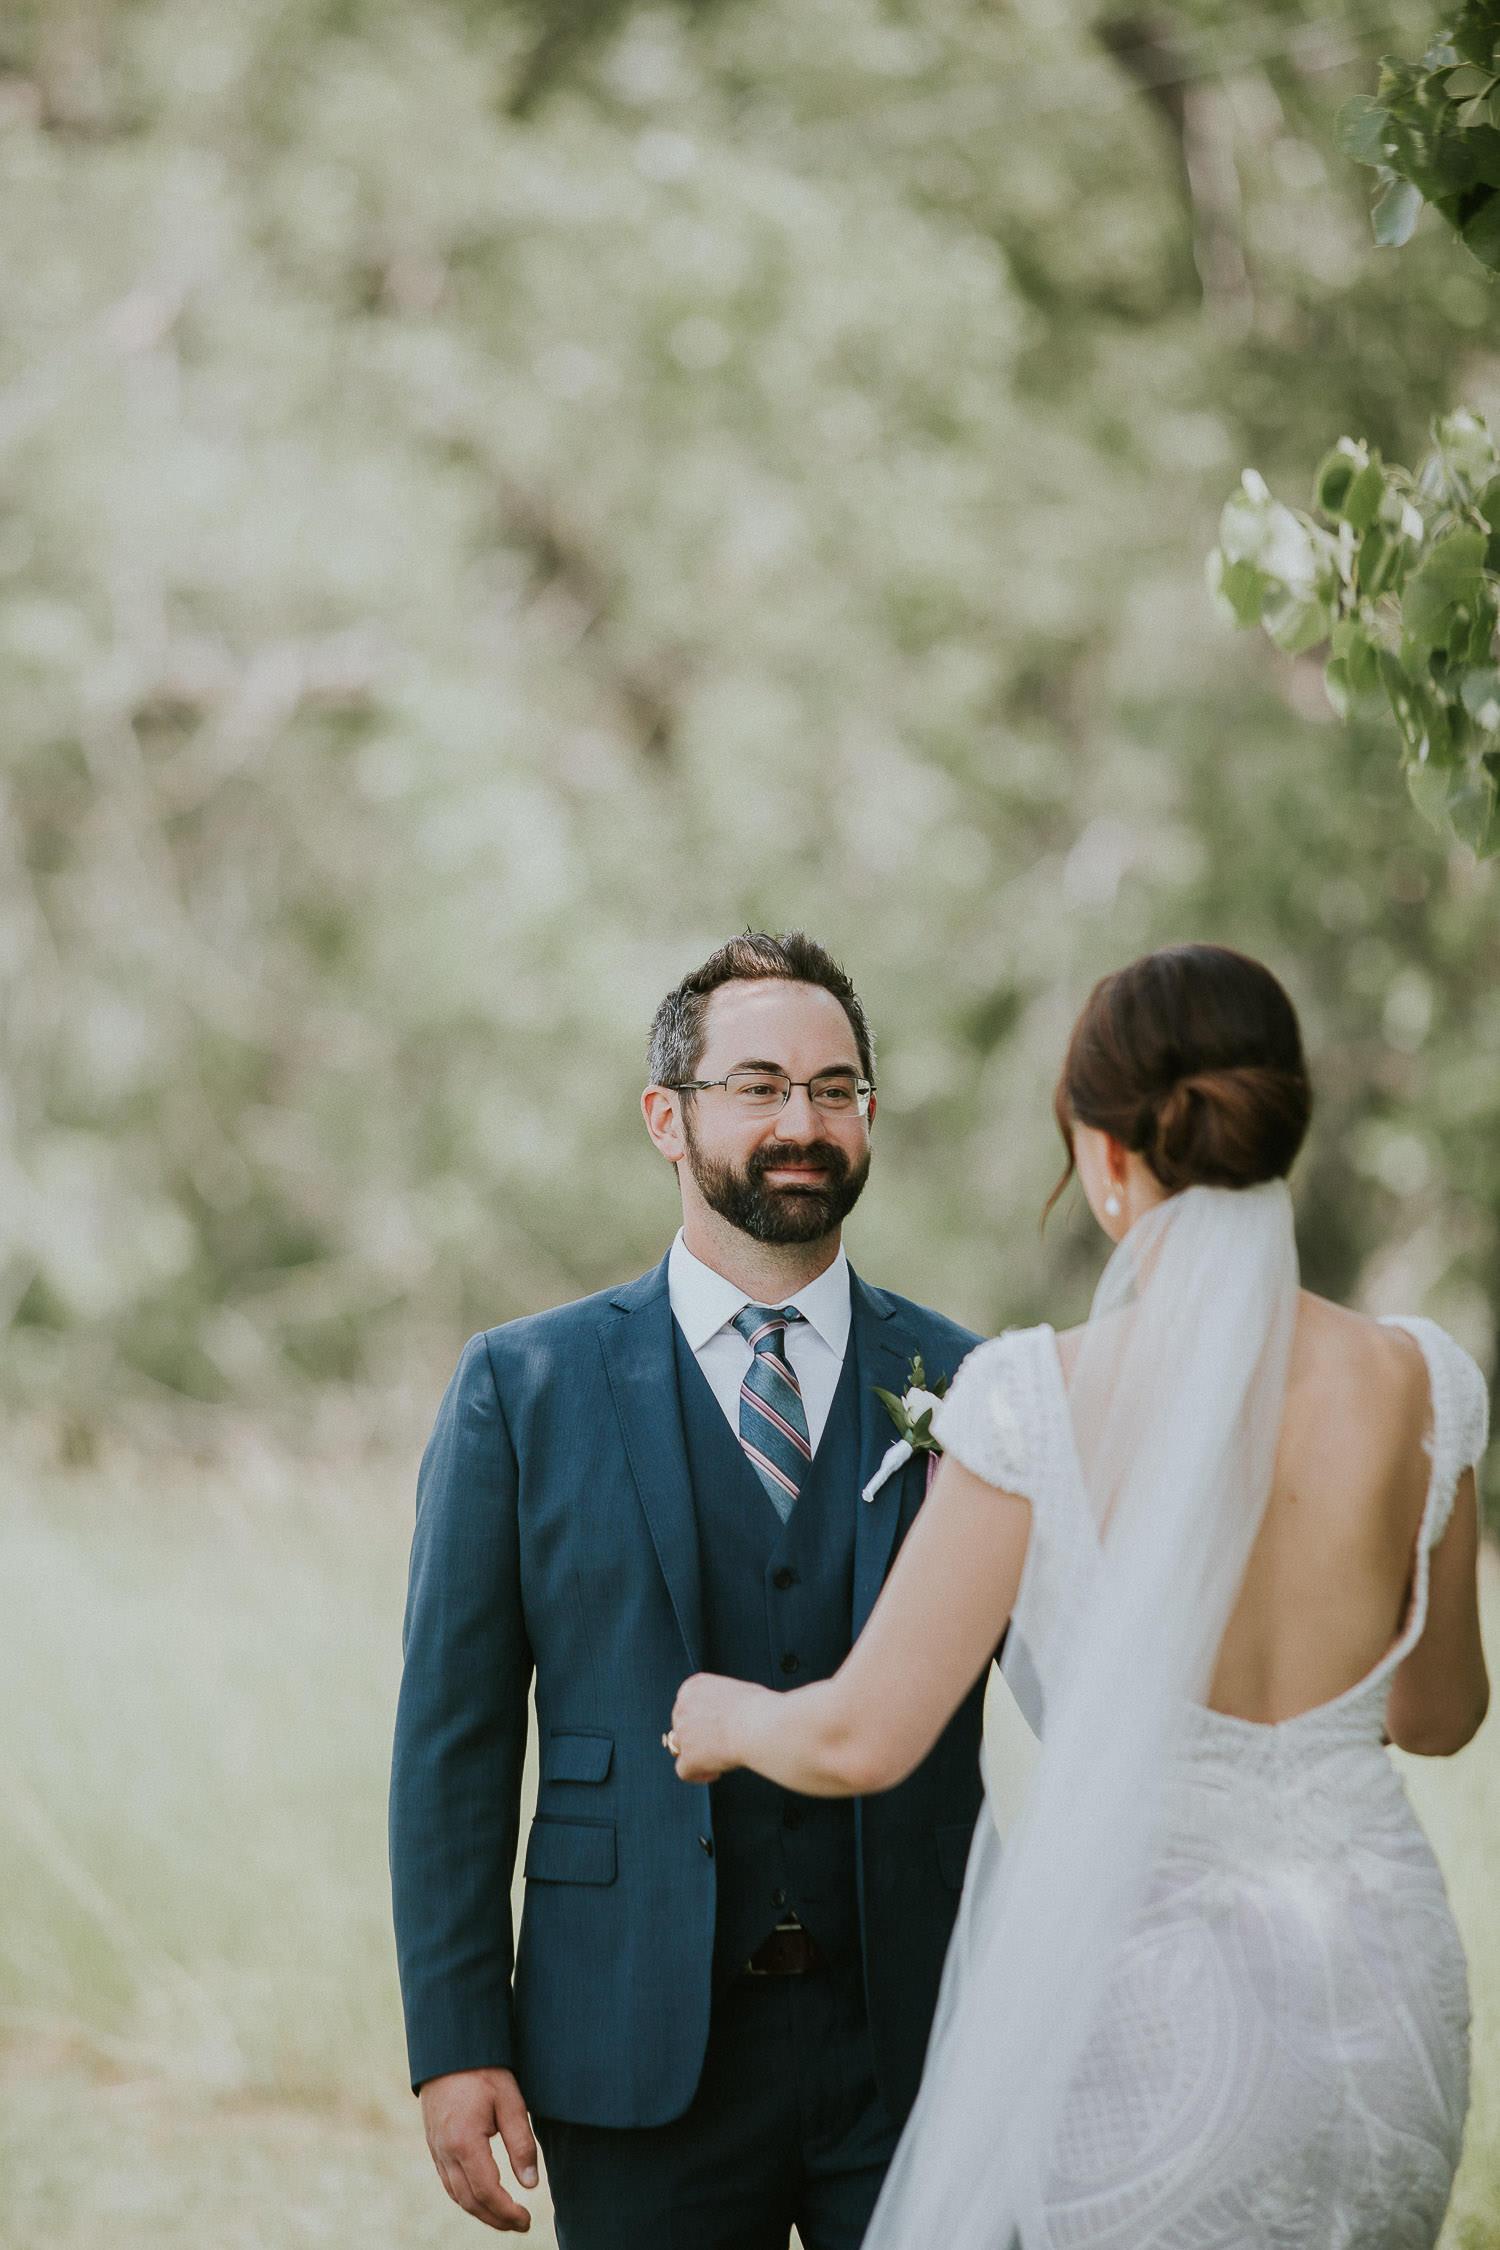 summer-backyard-wedding-in-alberta-sarah-pukin-0043